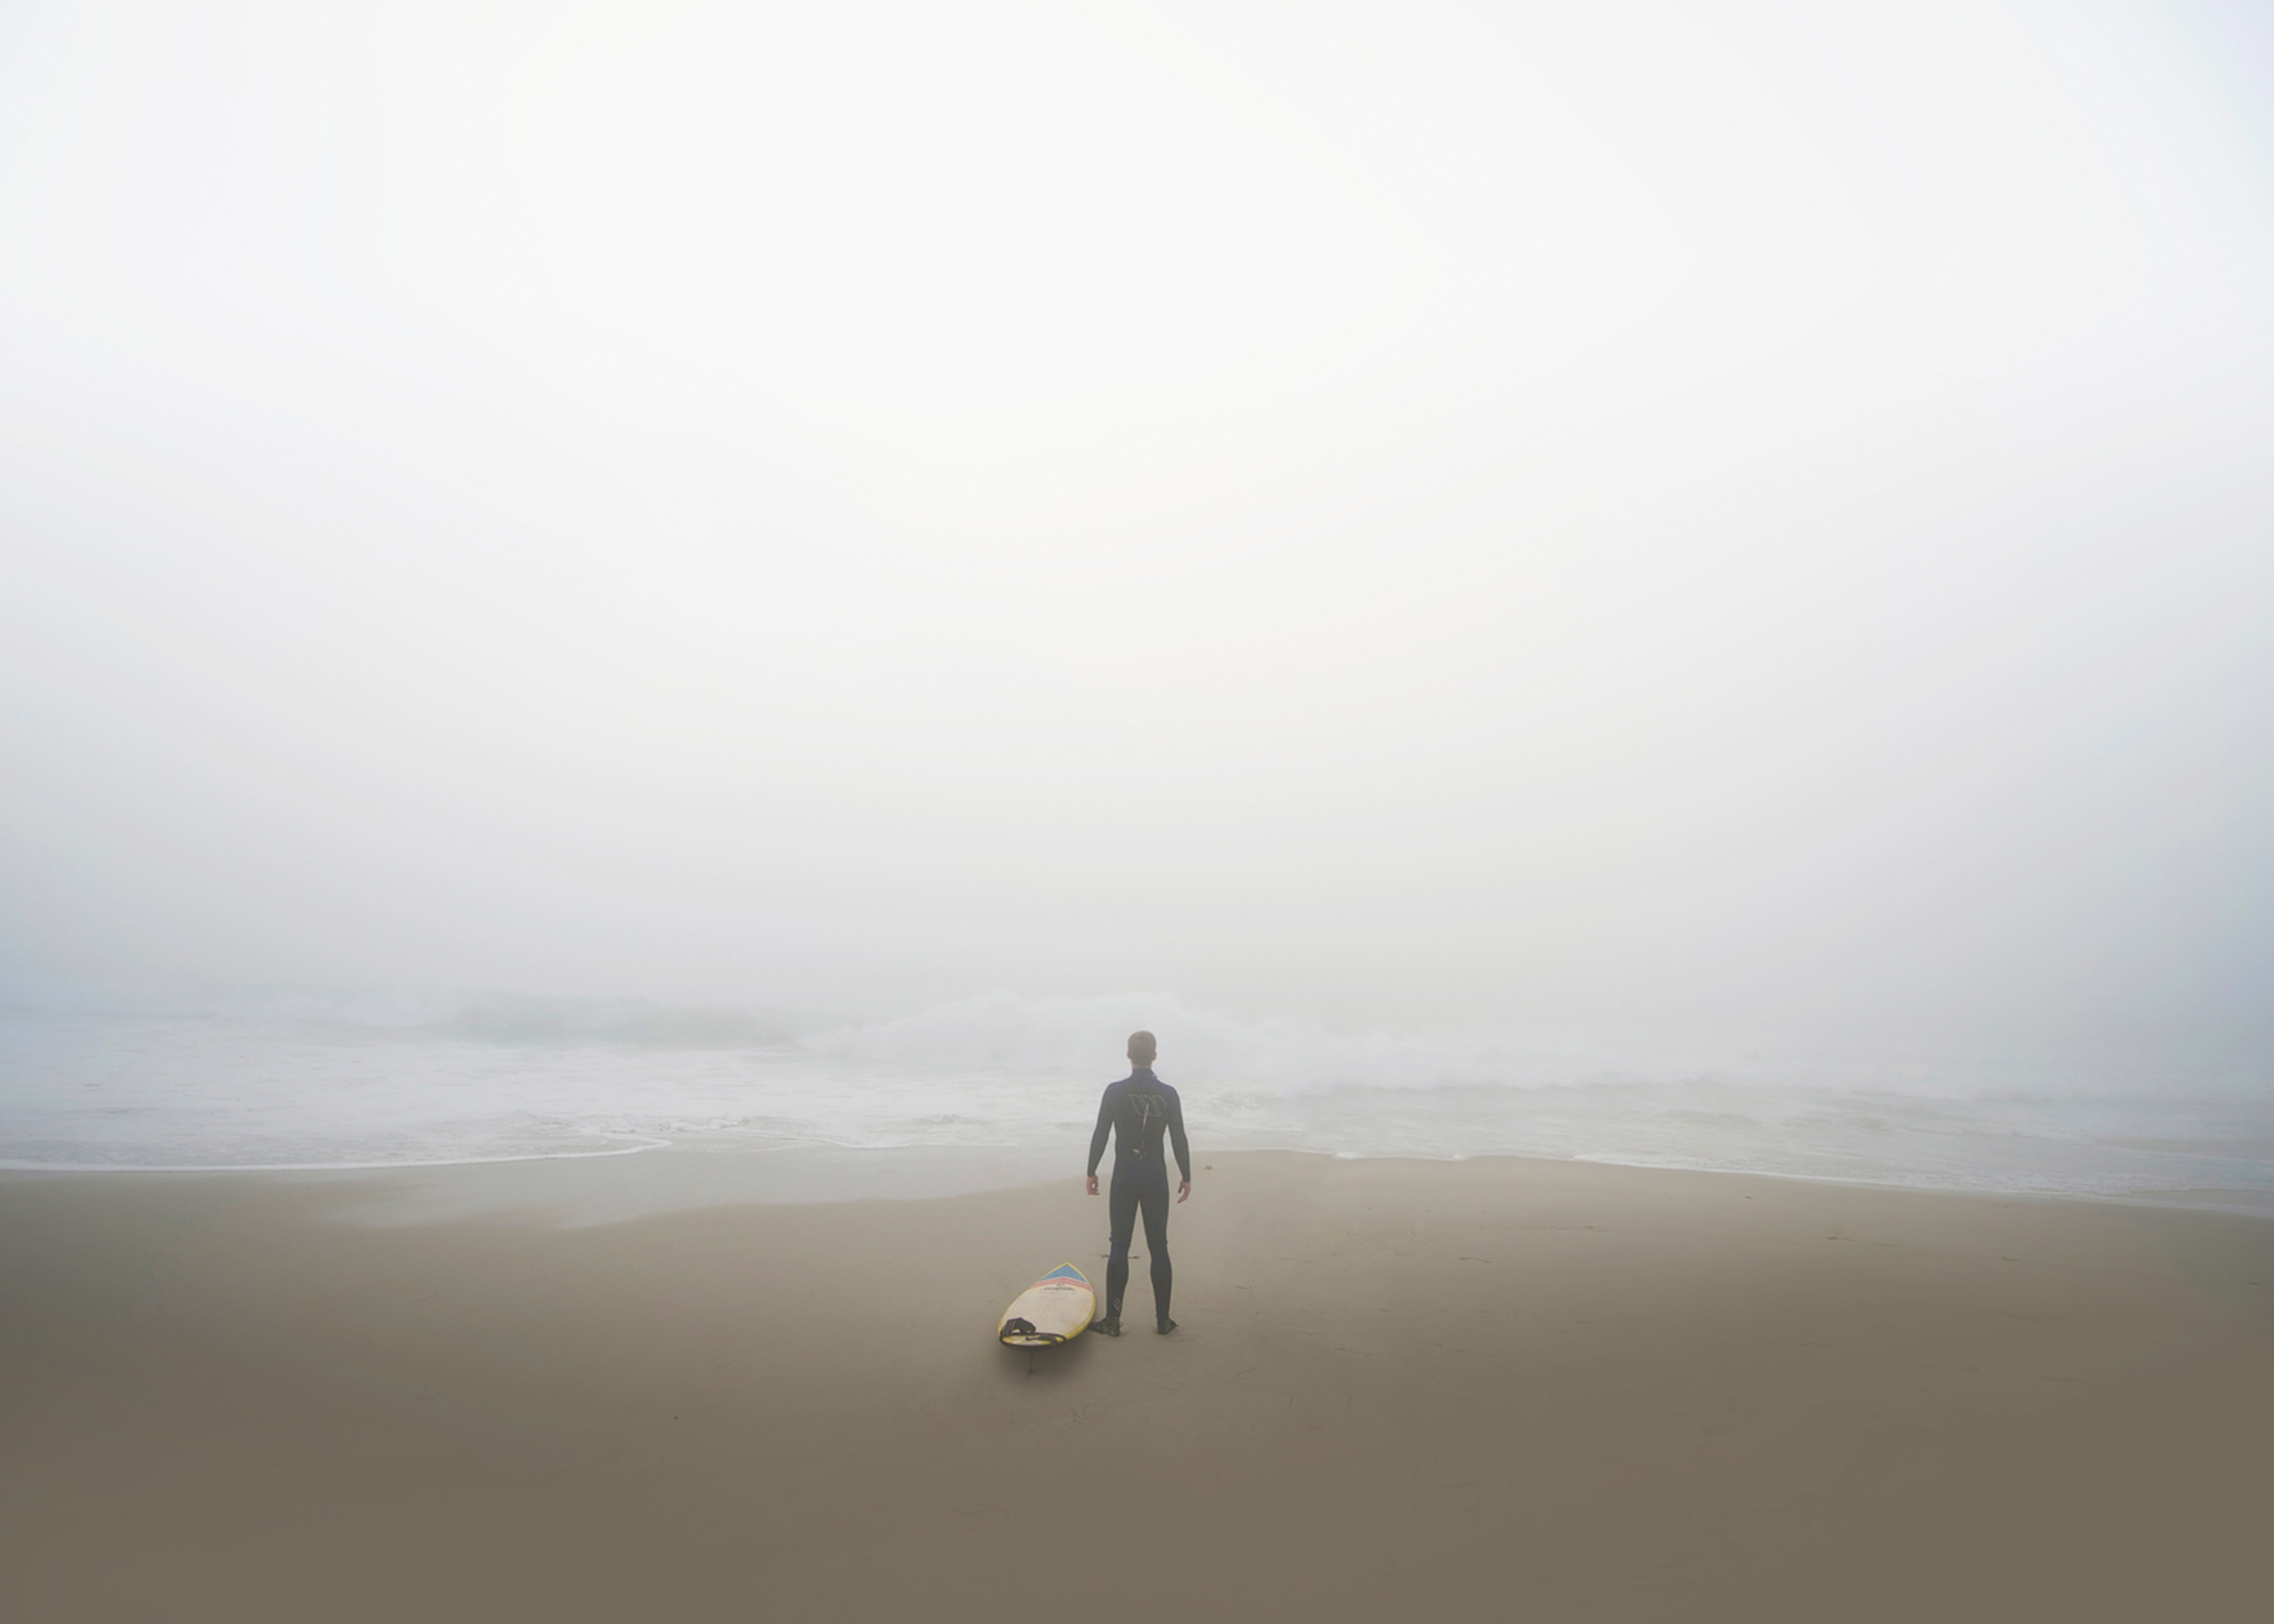 man standing beside surfboard on seashore